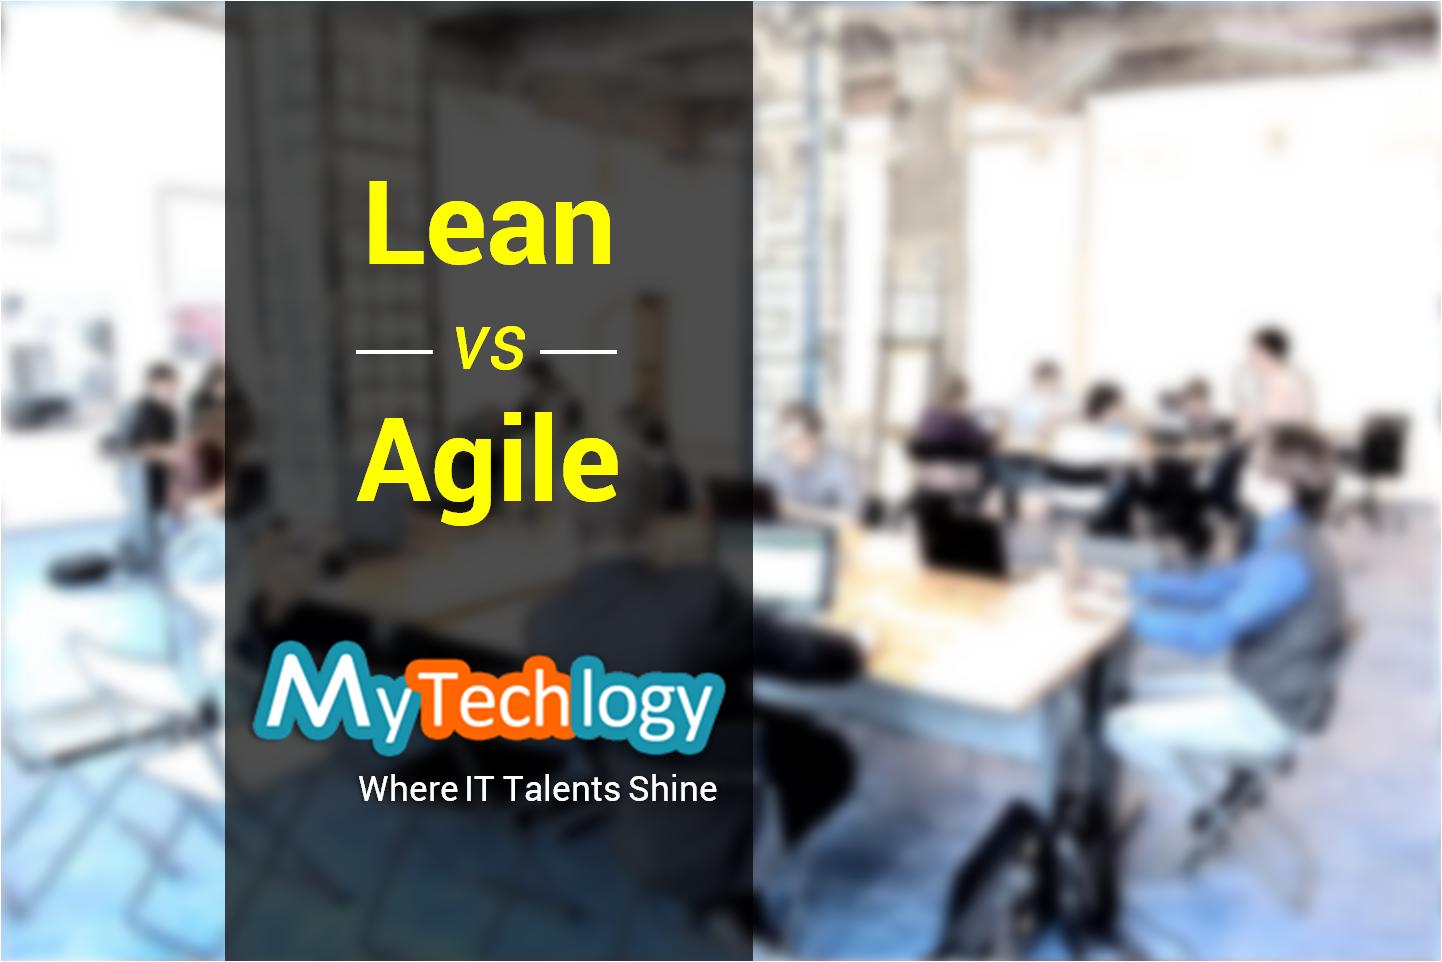 Lean vs Agile Programming - Image 1